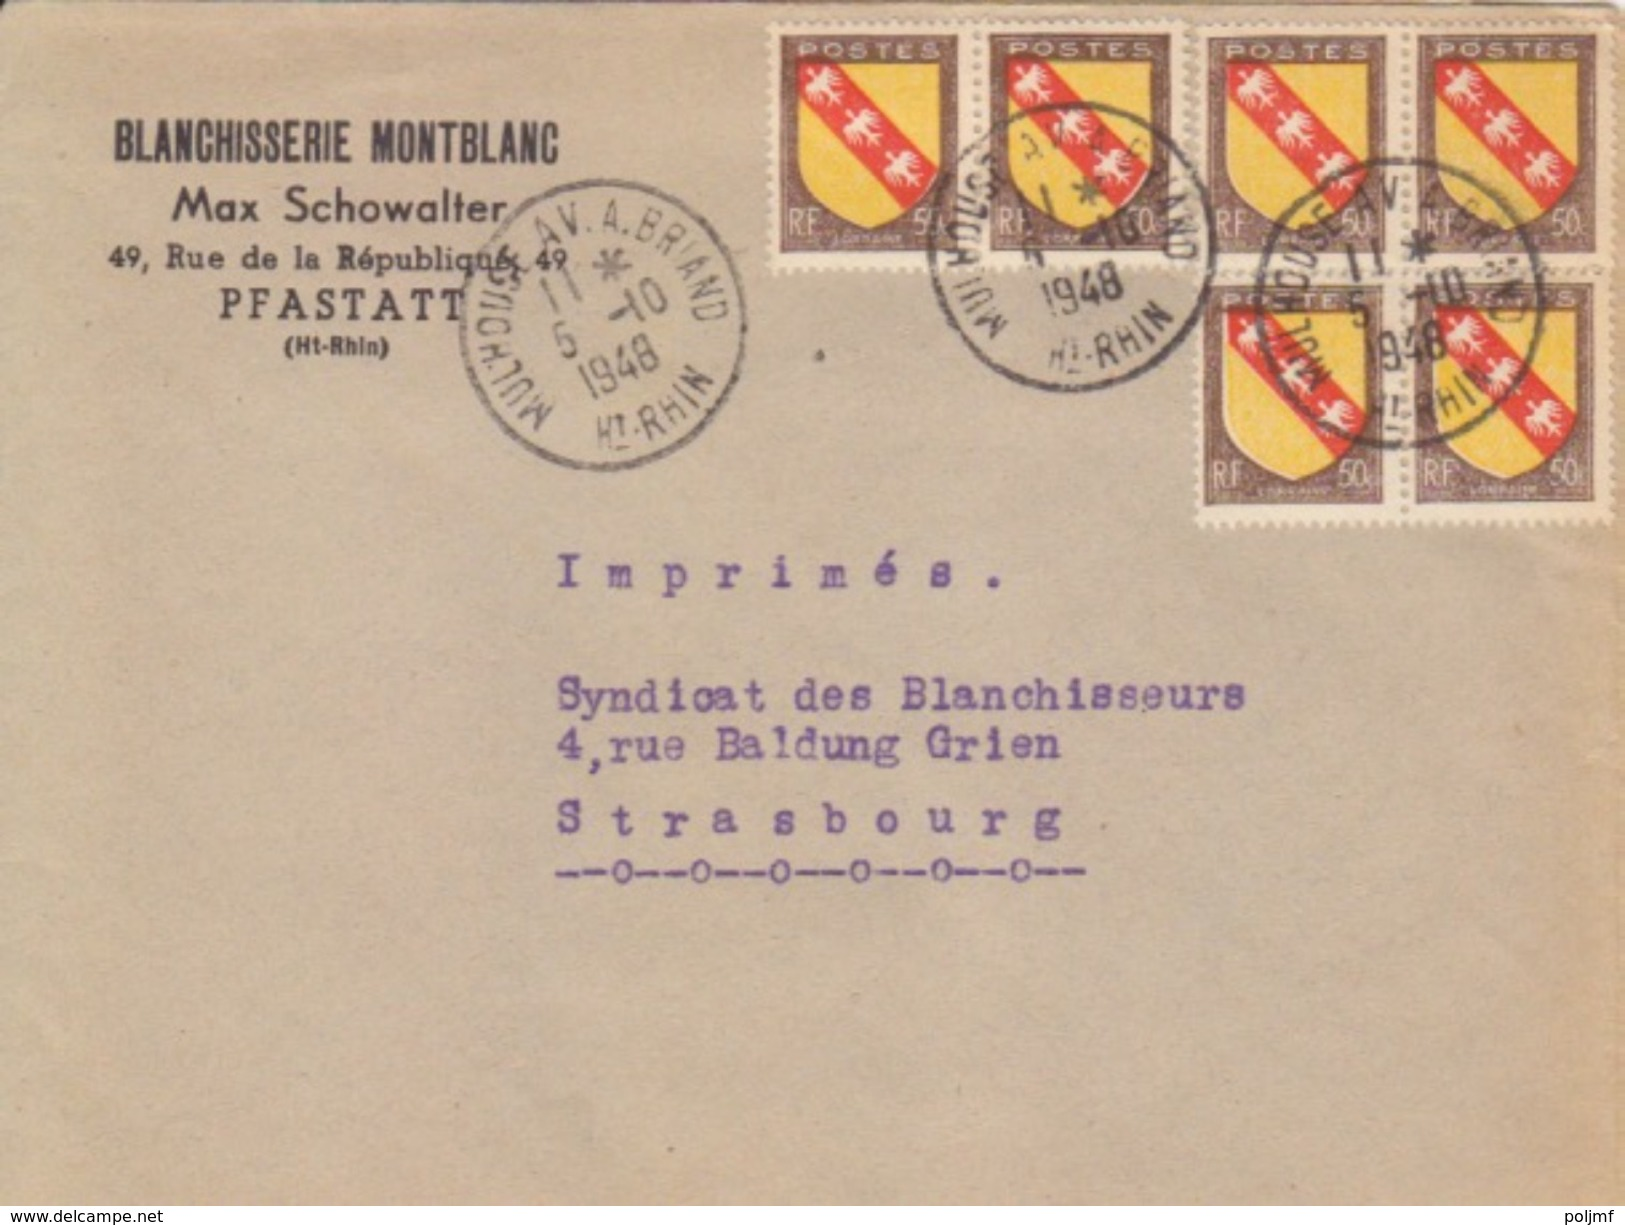 Haut Rhin, Lettre (blanchisserie Montblanc) 50c Blason Lorraine X 6 Obl. 5-10-48 Mulhouse Av. A. Briand Pour Strasbourg - Alsazia-Lorena